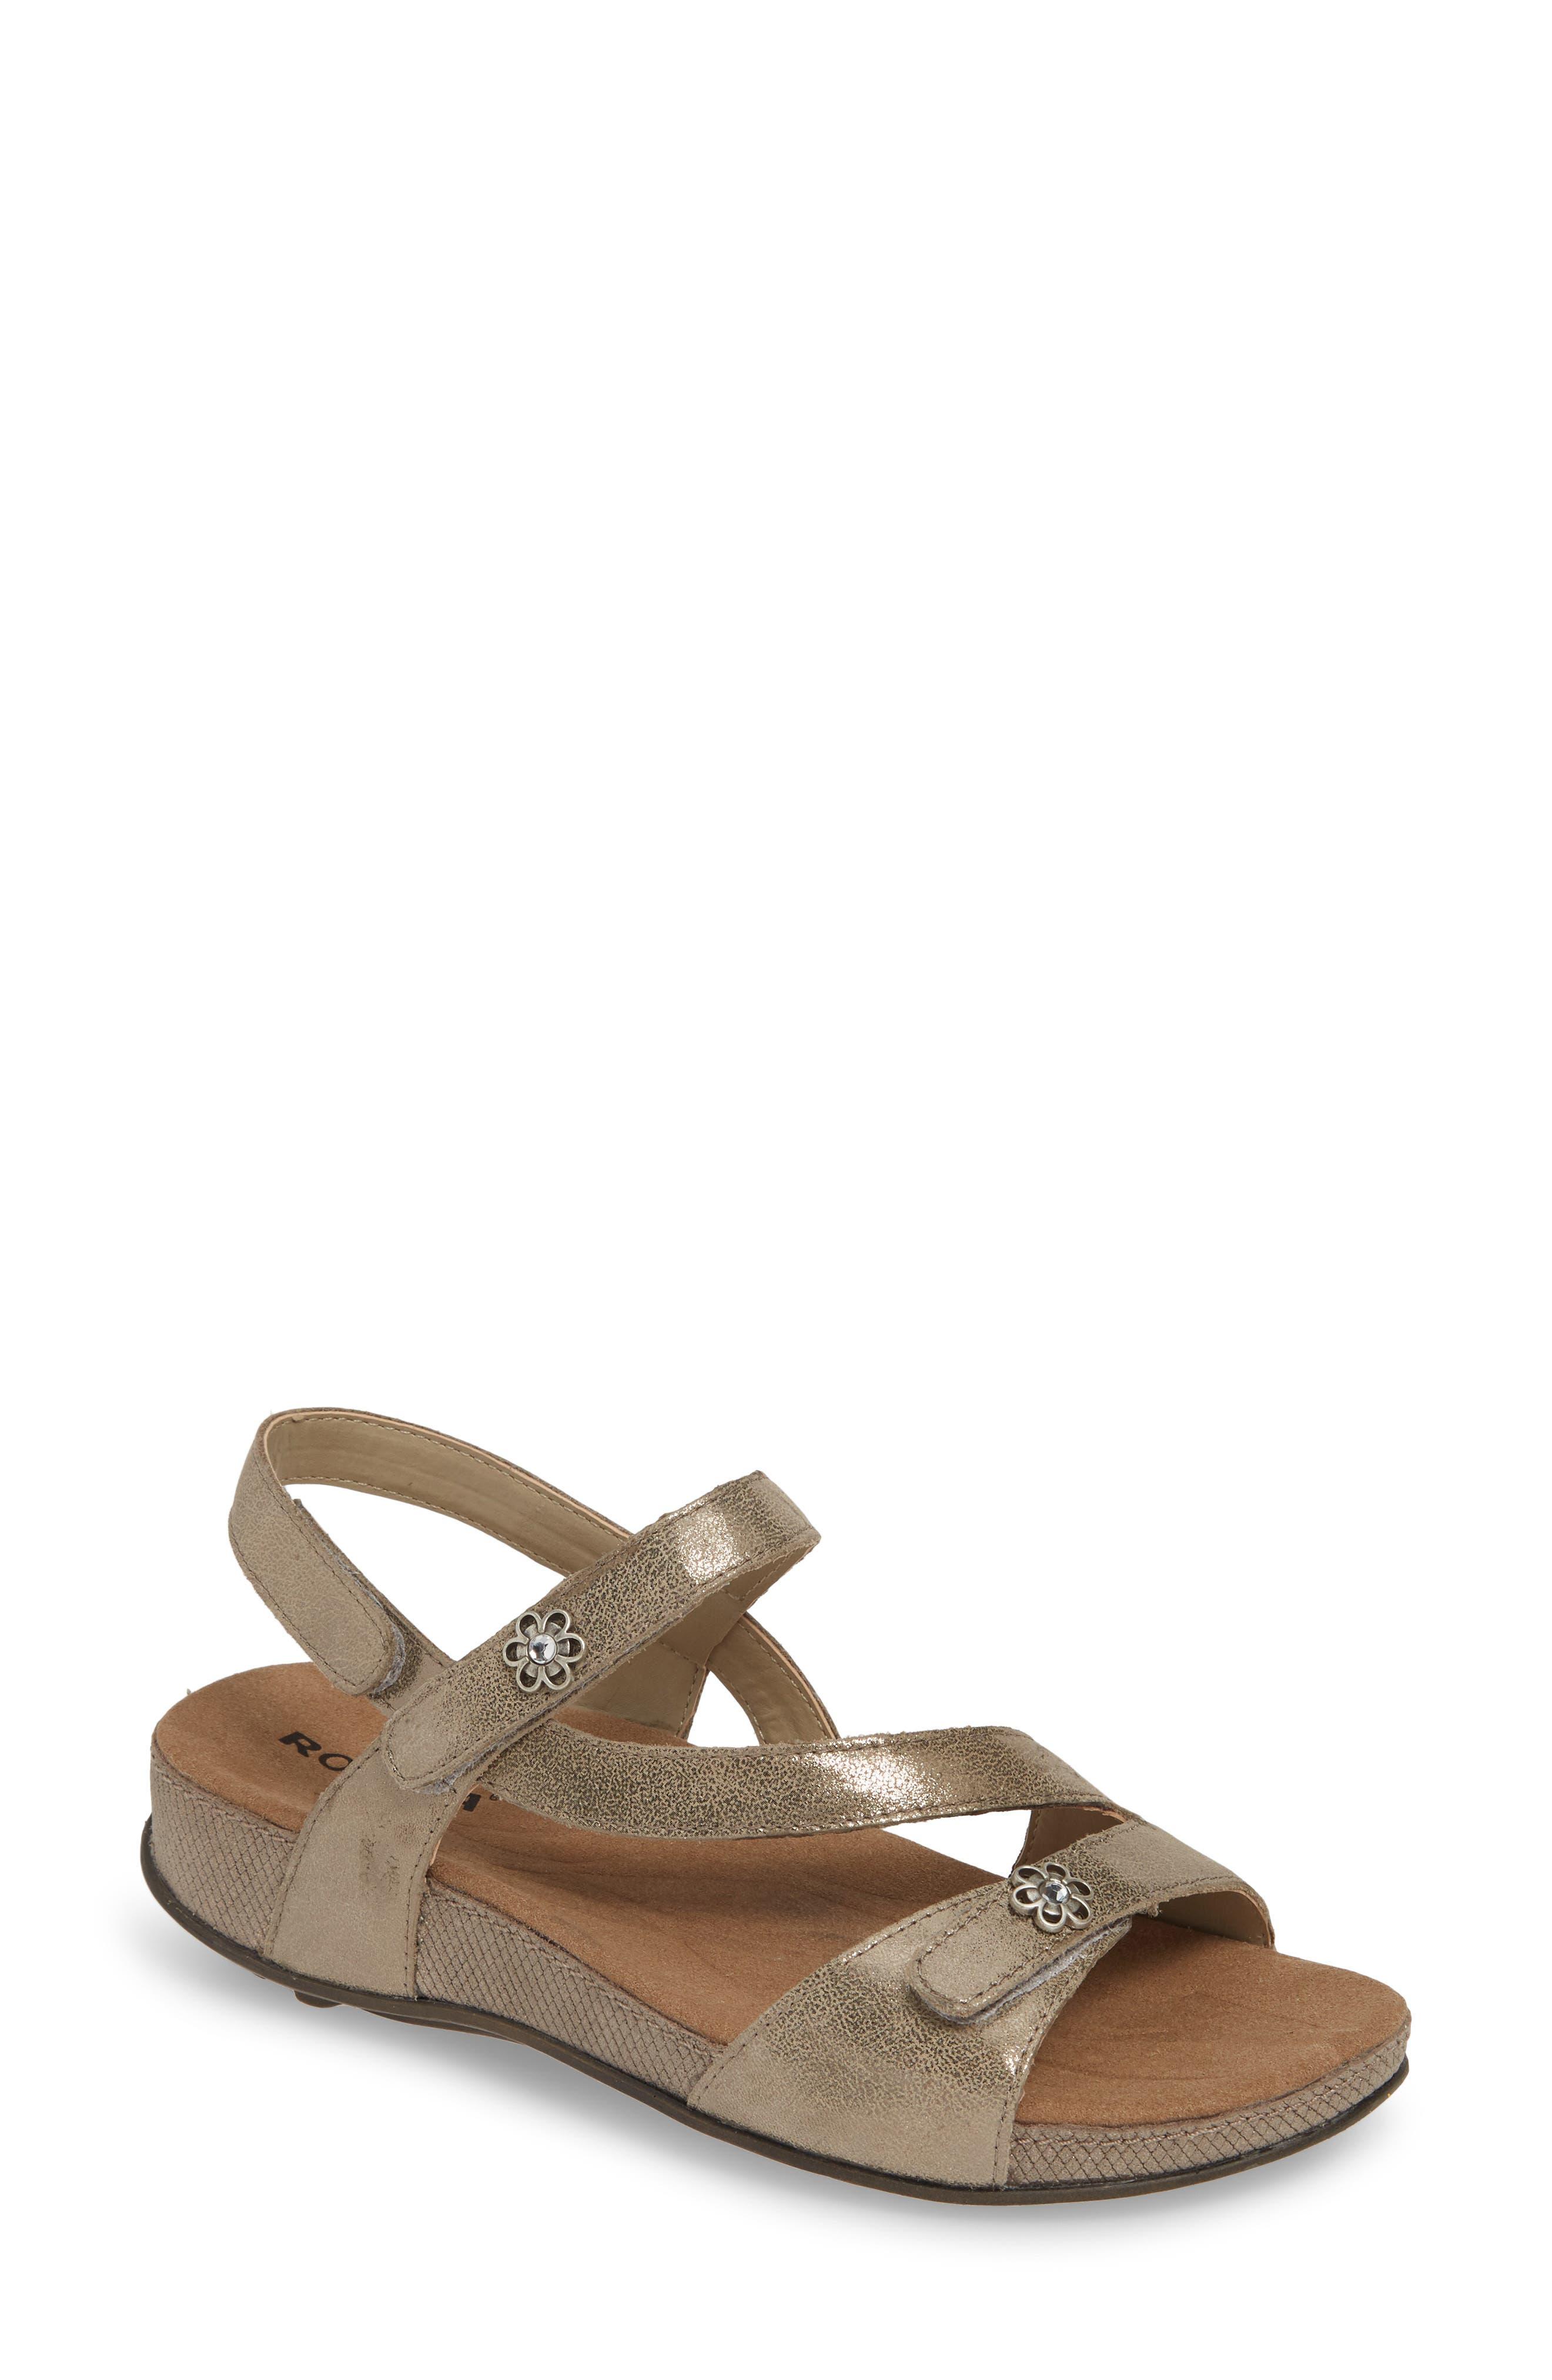 ROMIKA<SUP>®</SUP> Fidschi 54 Sandal, Main, color, BRONZE LEATHER